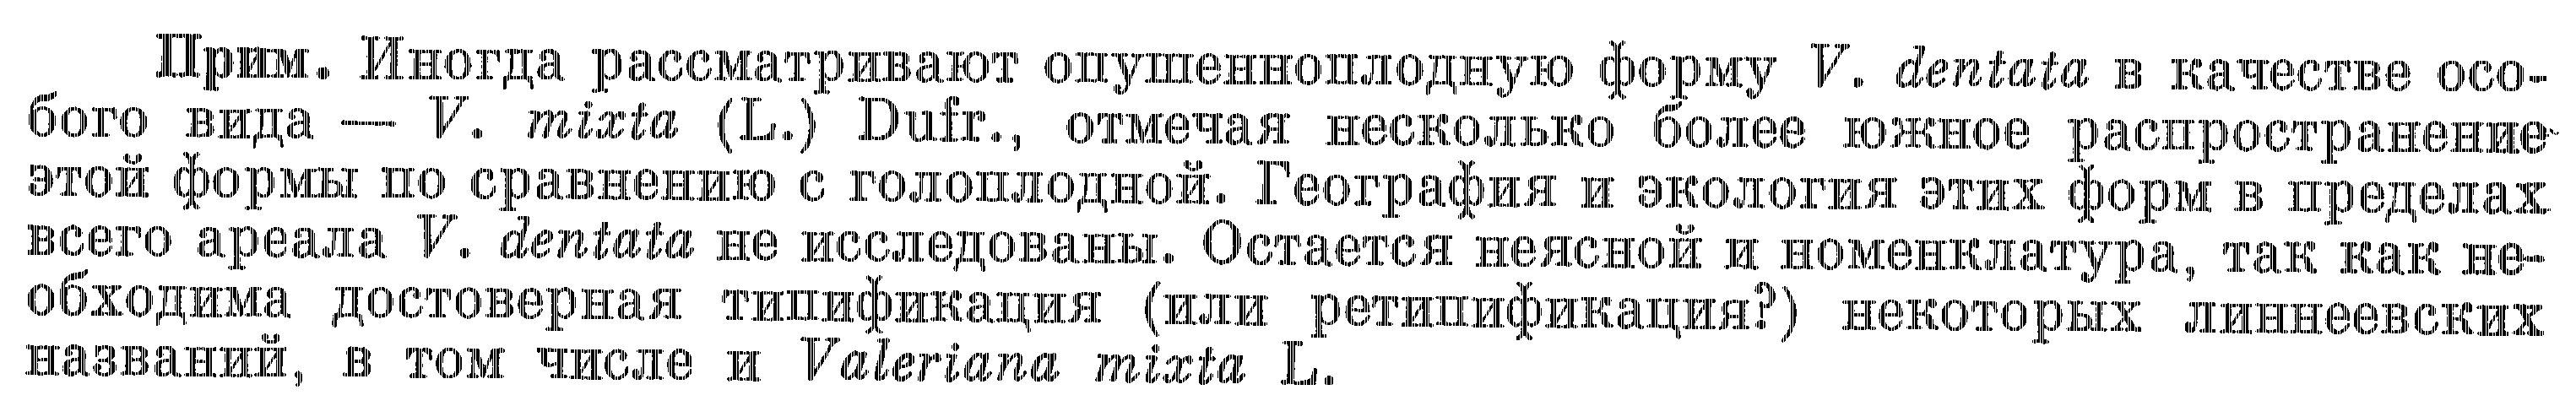 http://forum.plantarium.ru/misc.php?action=pun_attachment&item=24714&download=0